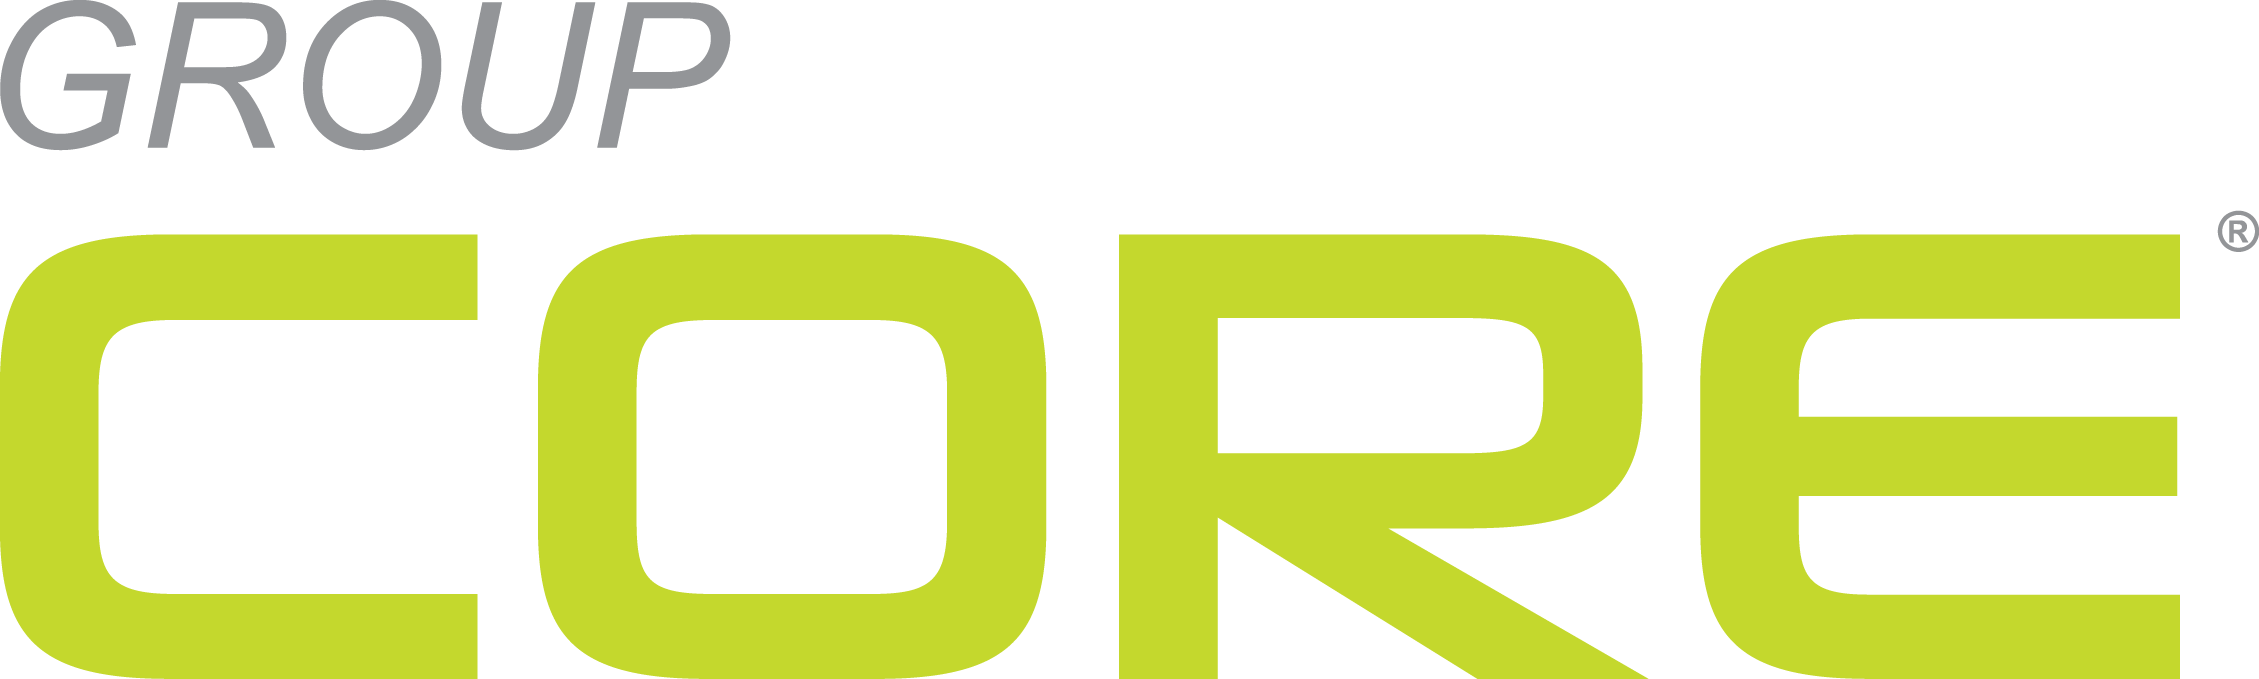 Gropu Core